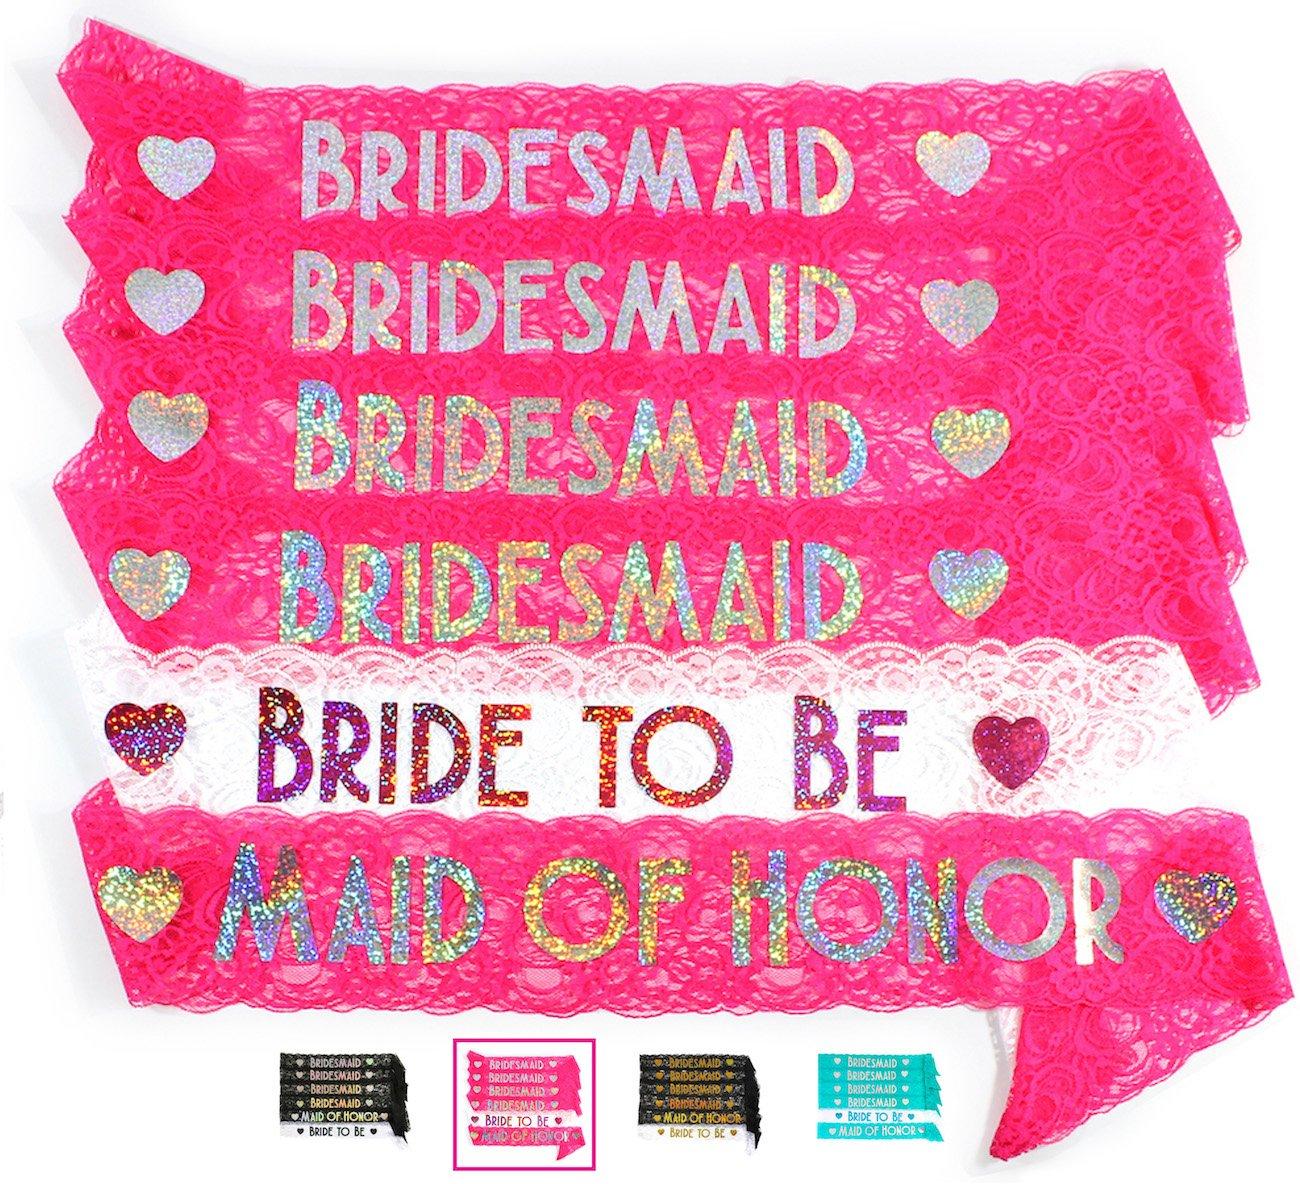 Amazon.com: Bride & Bridesmaid 6pc Lace Sash Set - Stunning Party ...